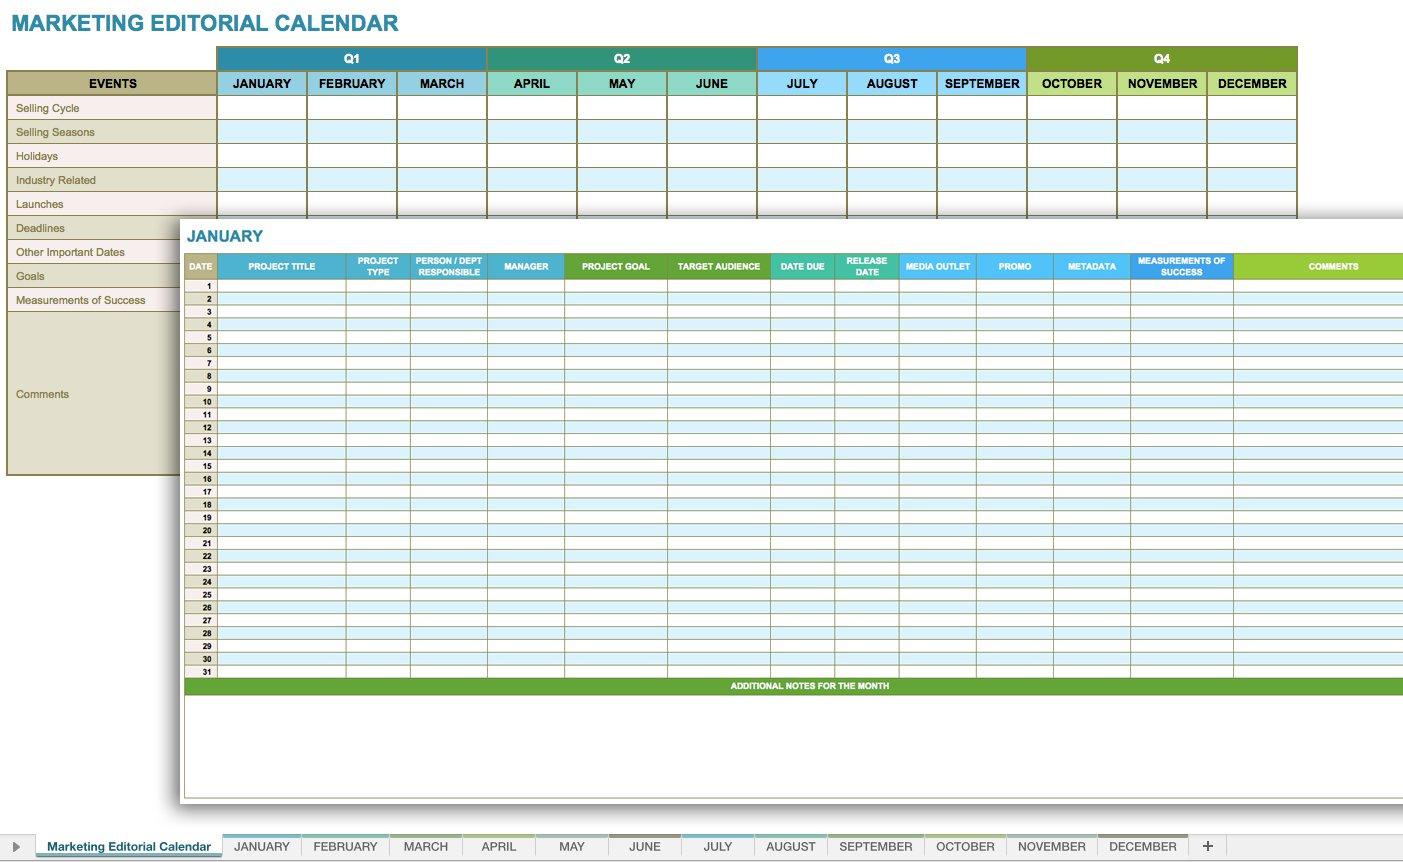 Monthly Calendar Spreadsheet In 12 Free Social Media Templates  Smartsheet